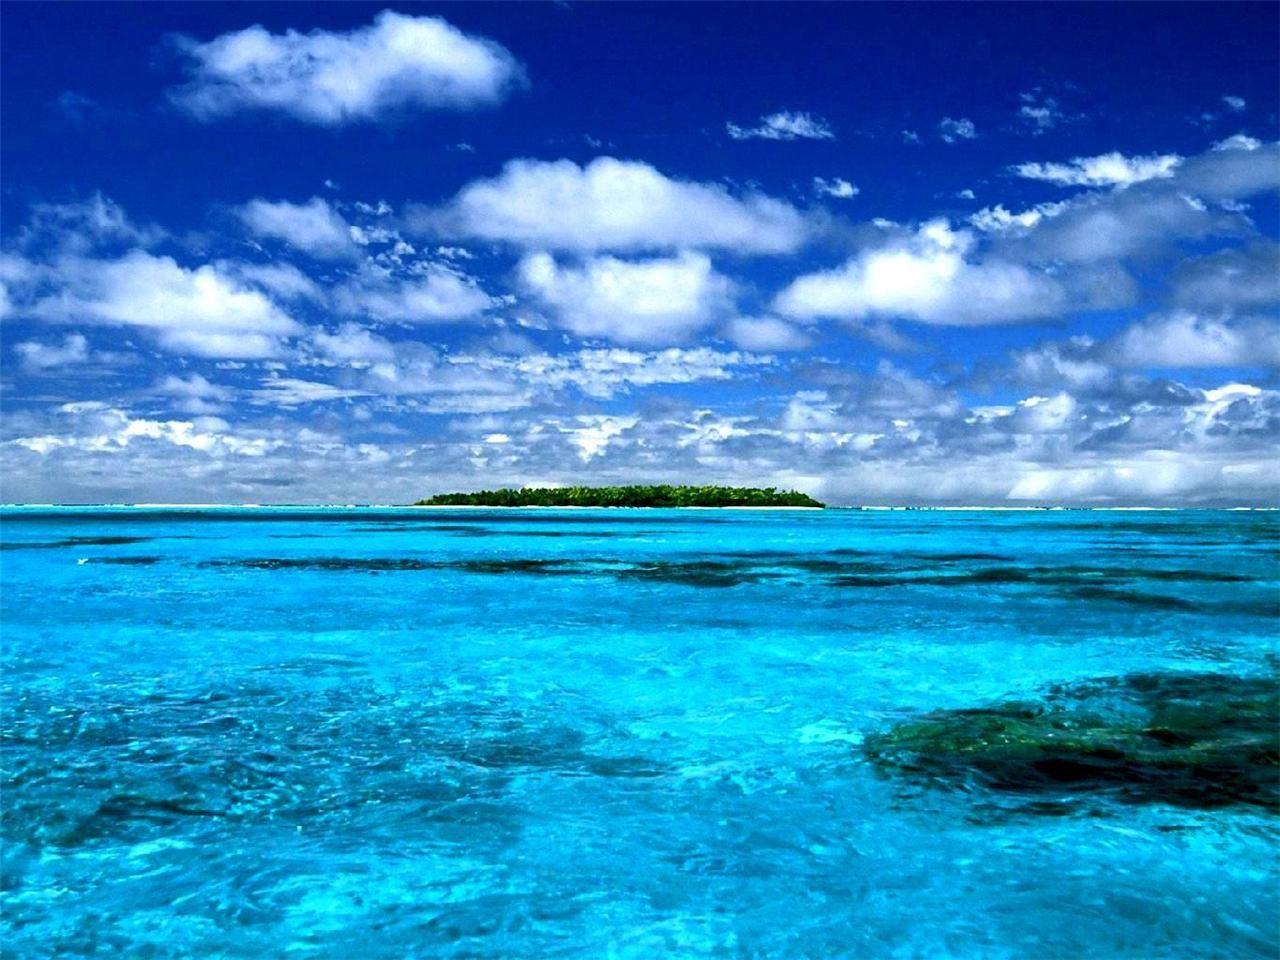 Key Largo Beaches Fl The Astounding Beaches And Scenery In The Florida Keys Is Enamoring Beach Wallpaper Beautiful Beaches Beach Images